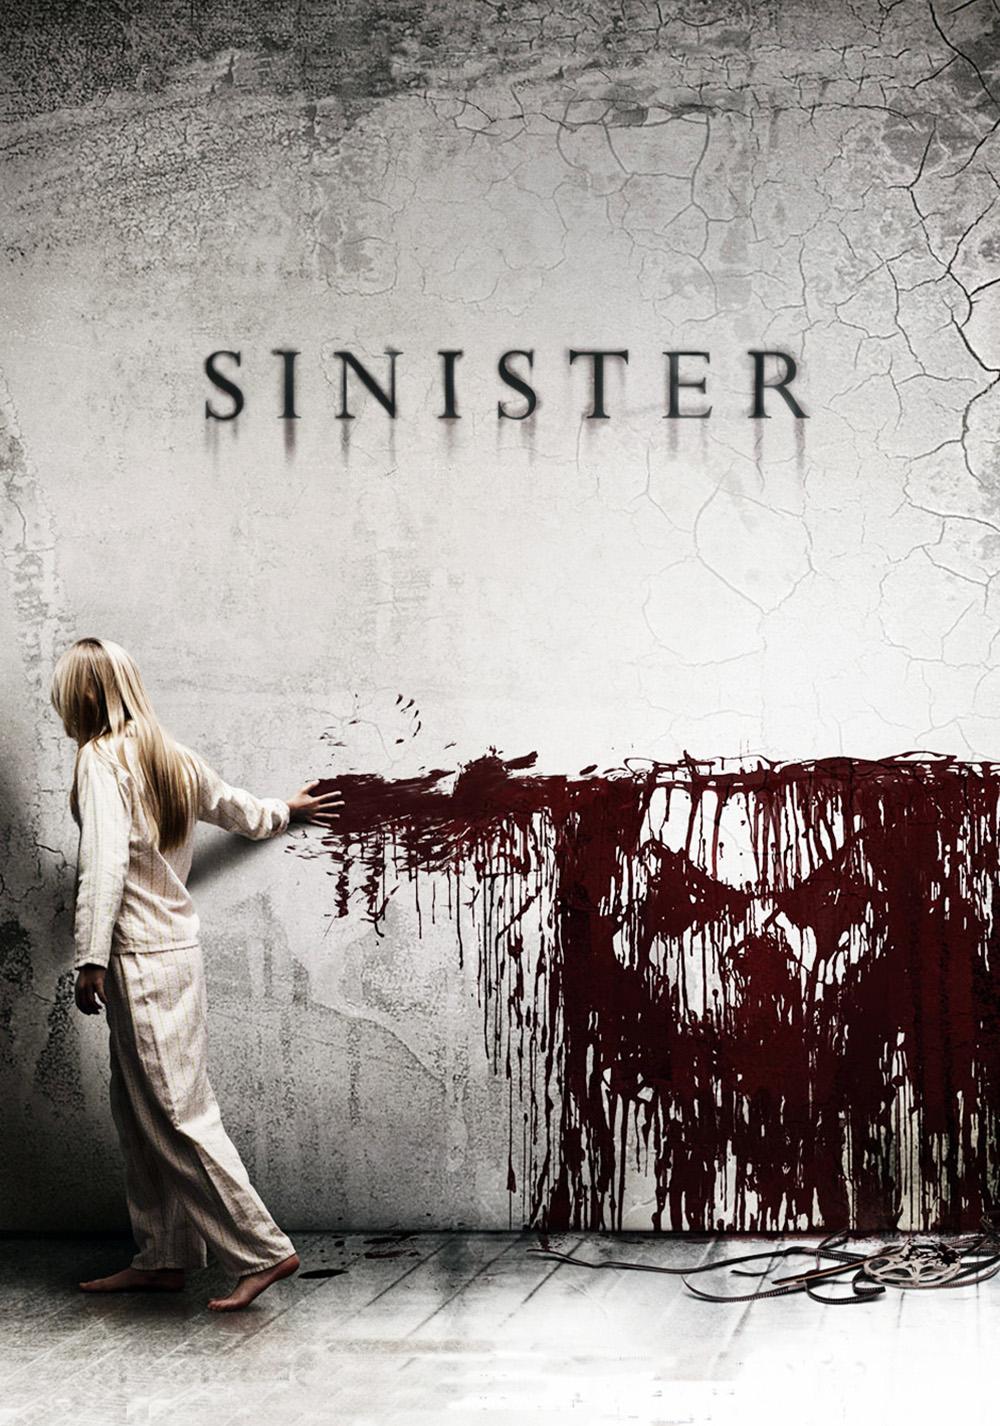 Sinister | Movie fanart | fanart.tv